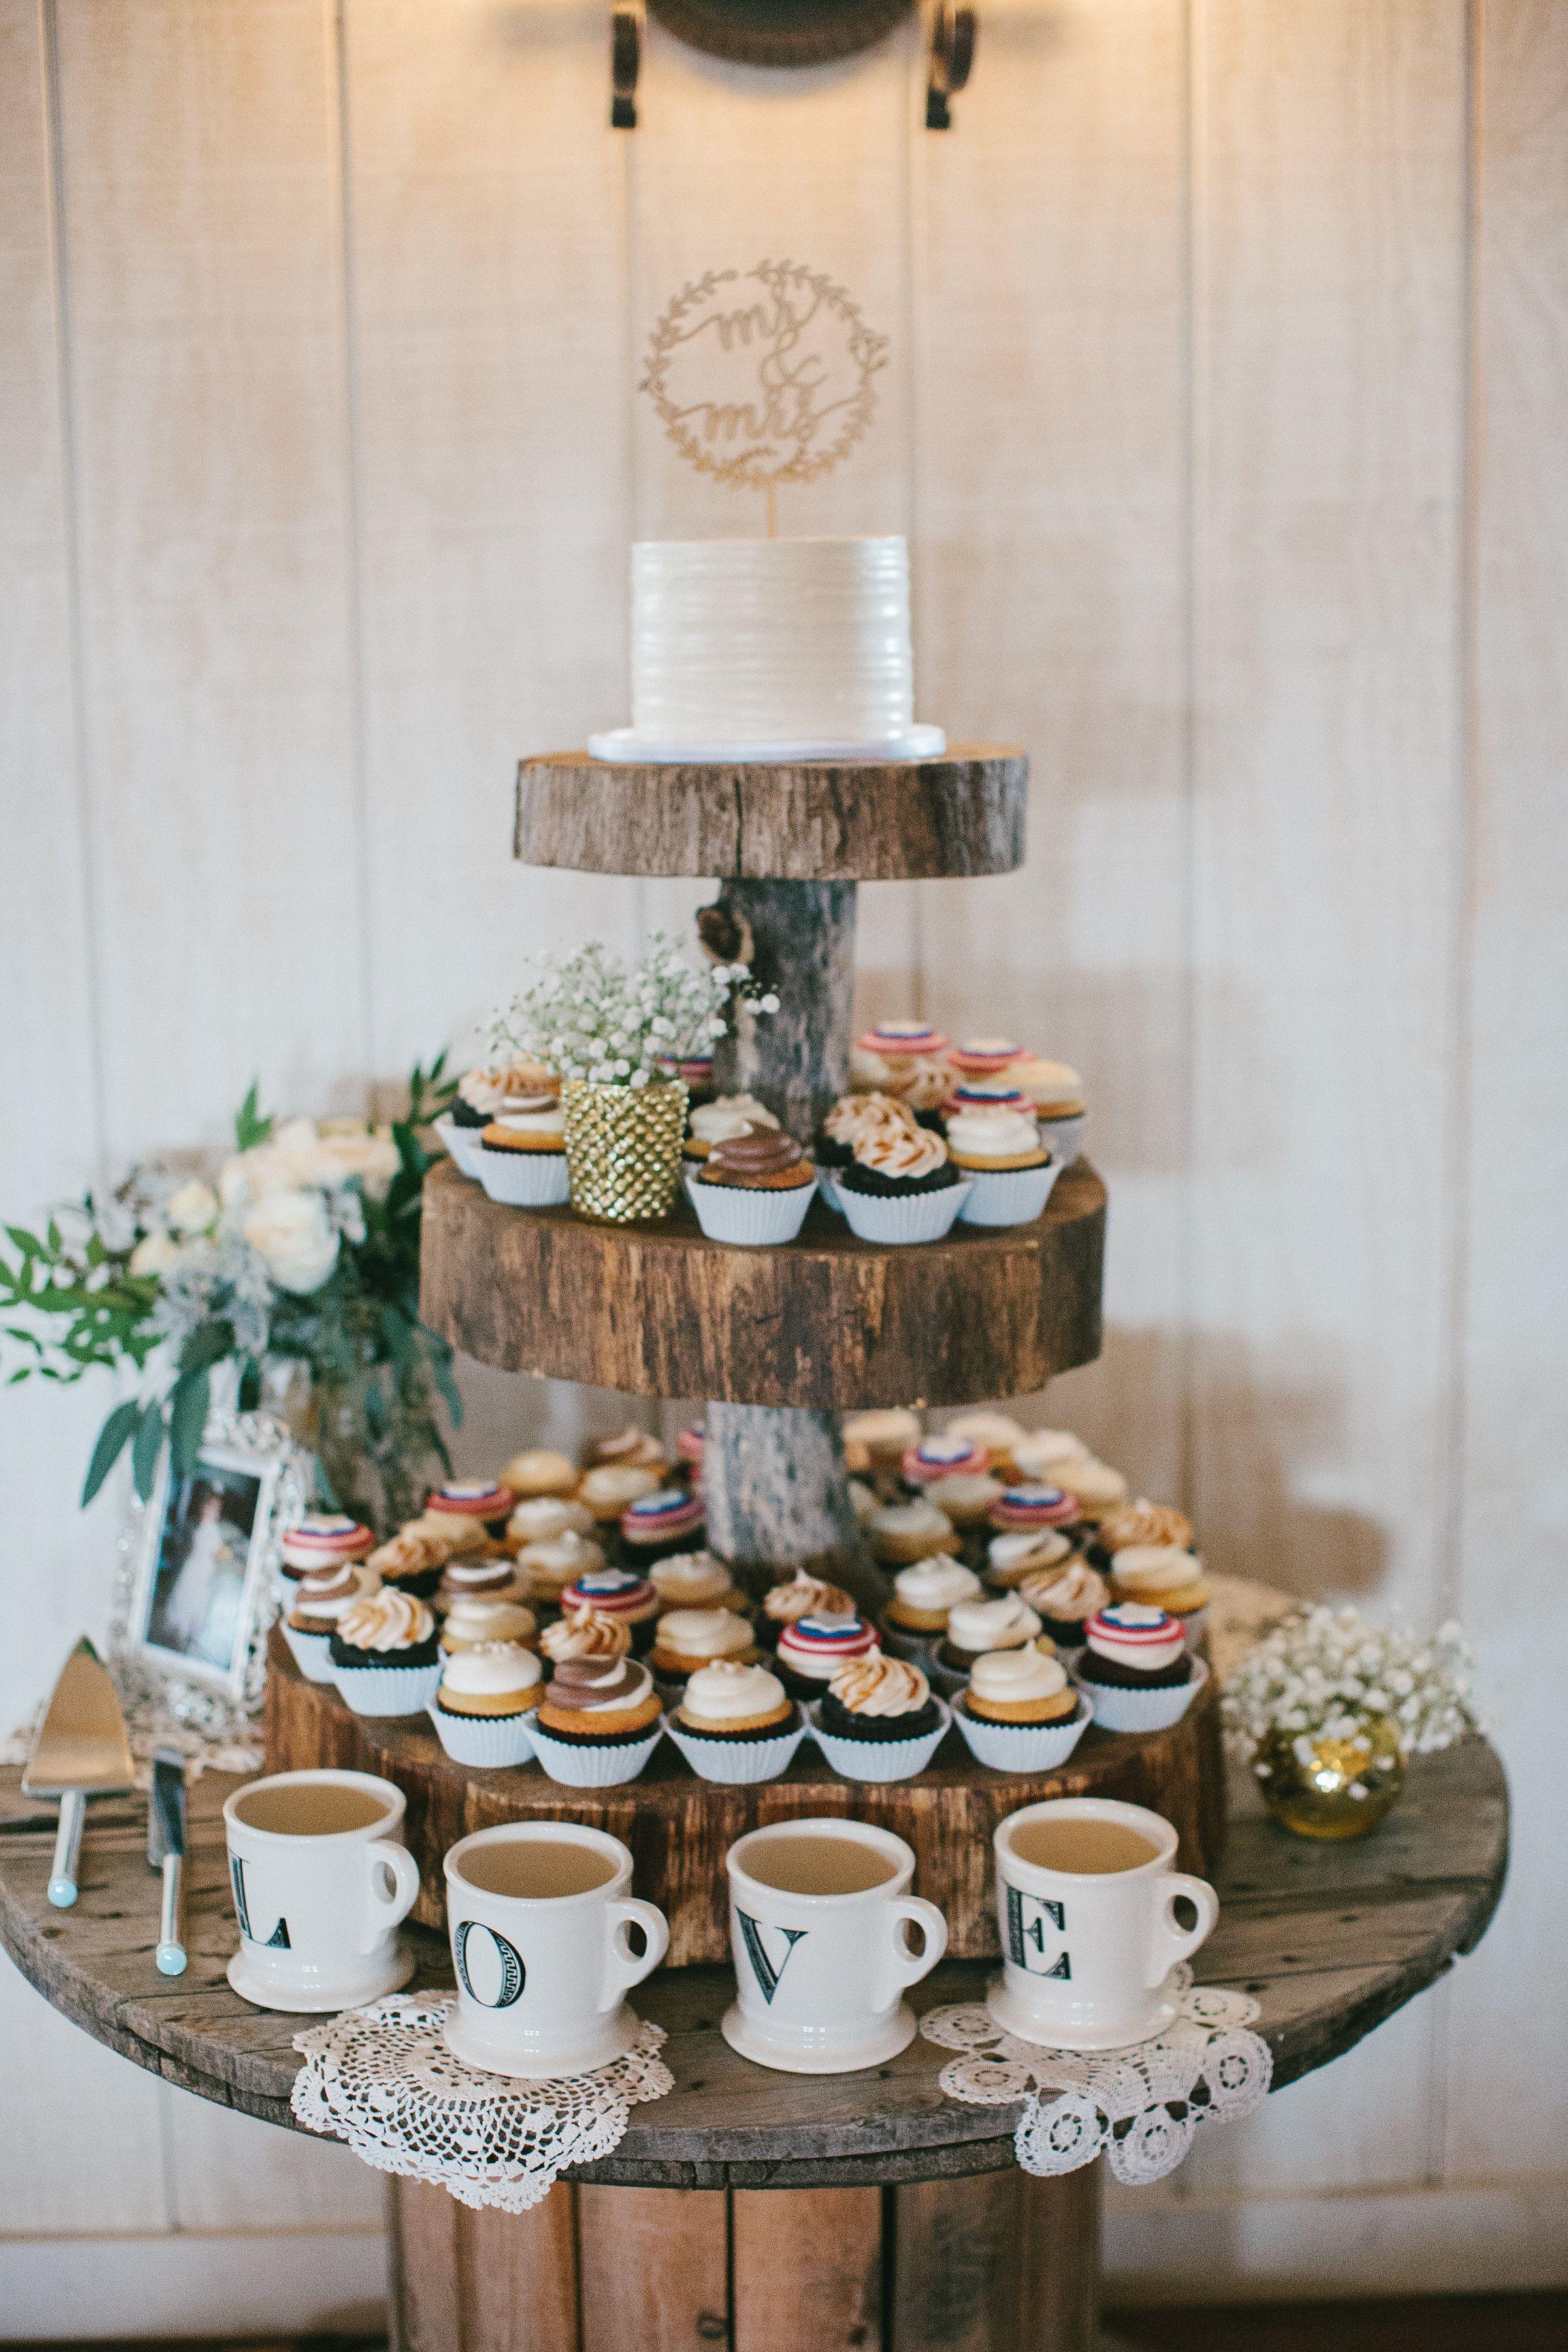 Rustic Wedding Cupcake Cake Table Dessert Table Cake